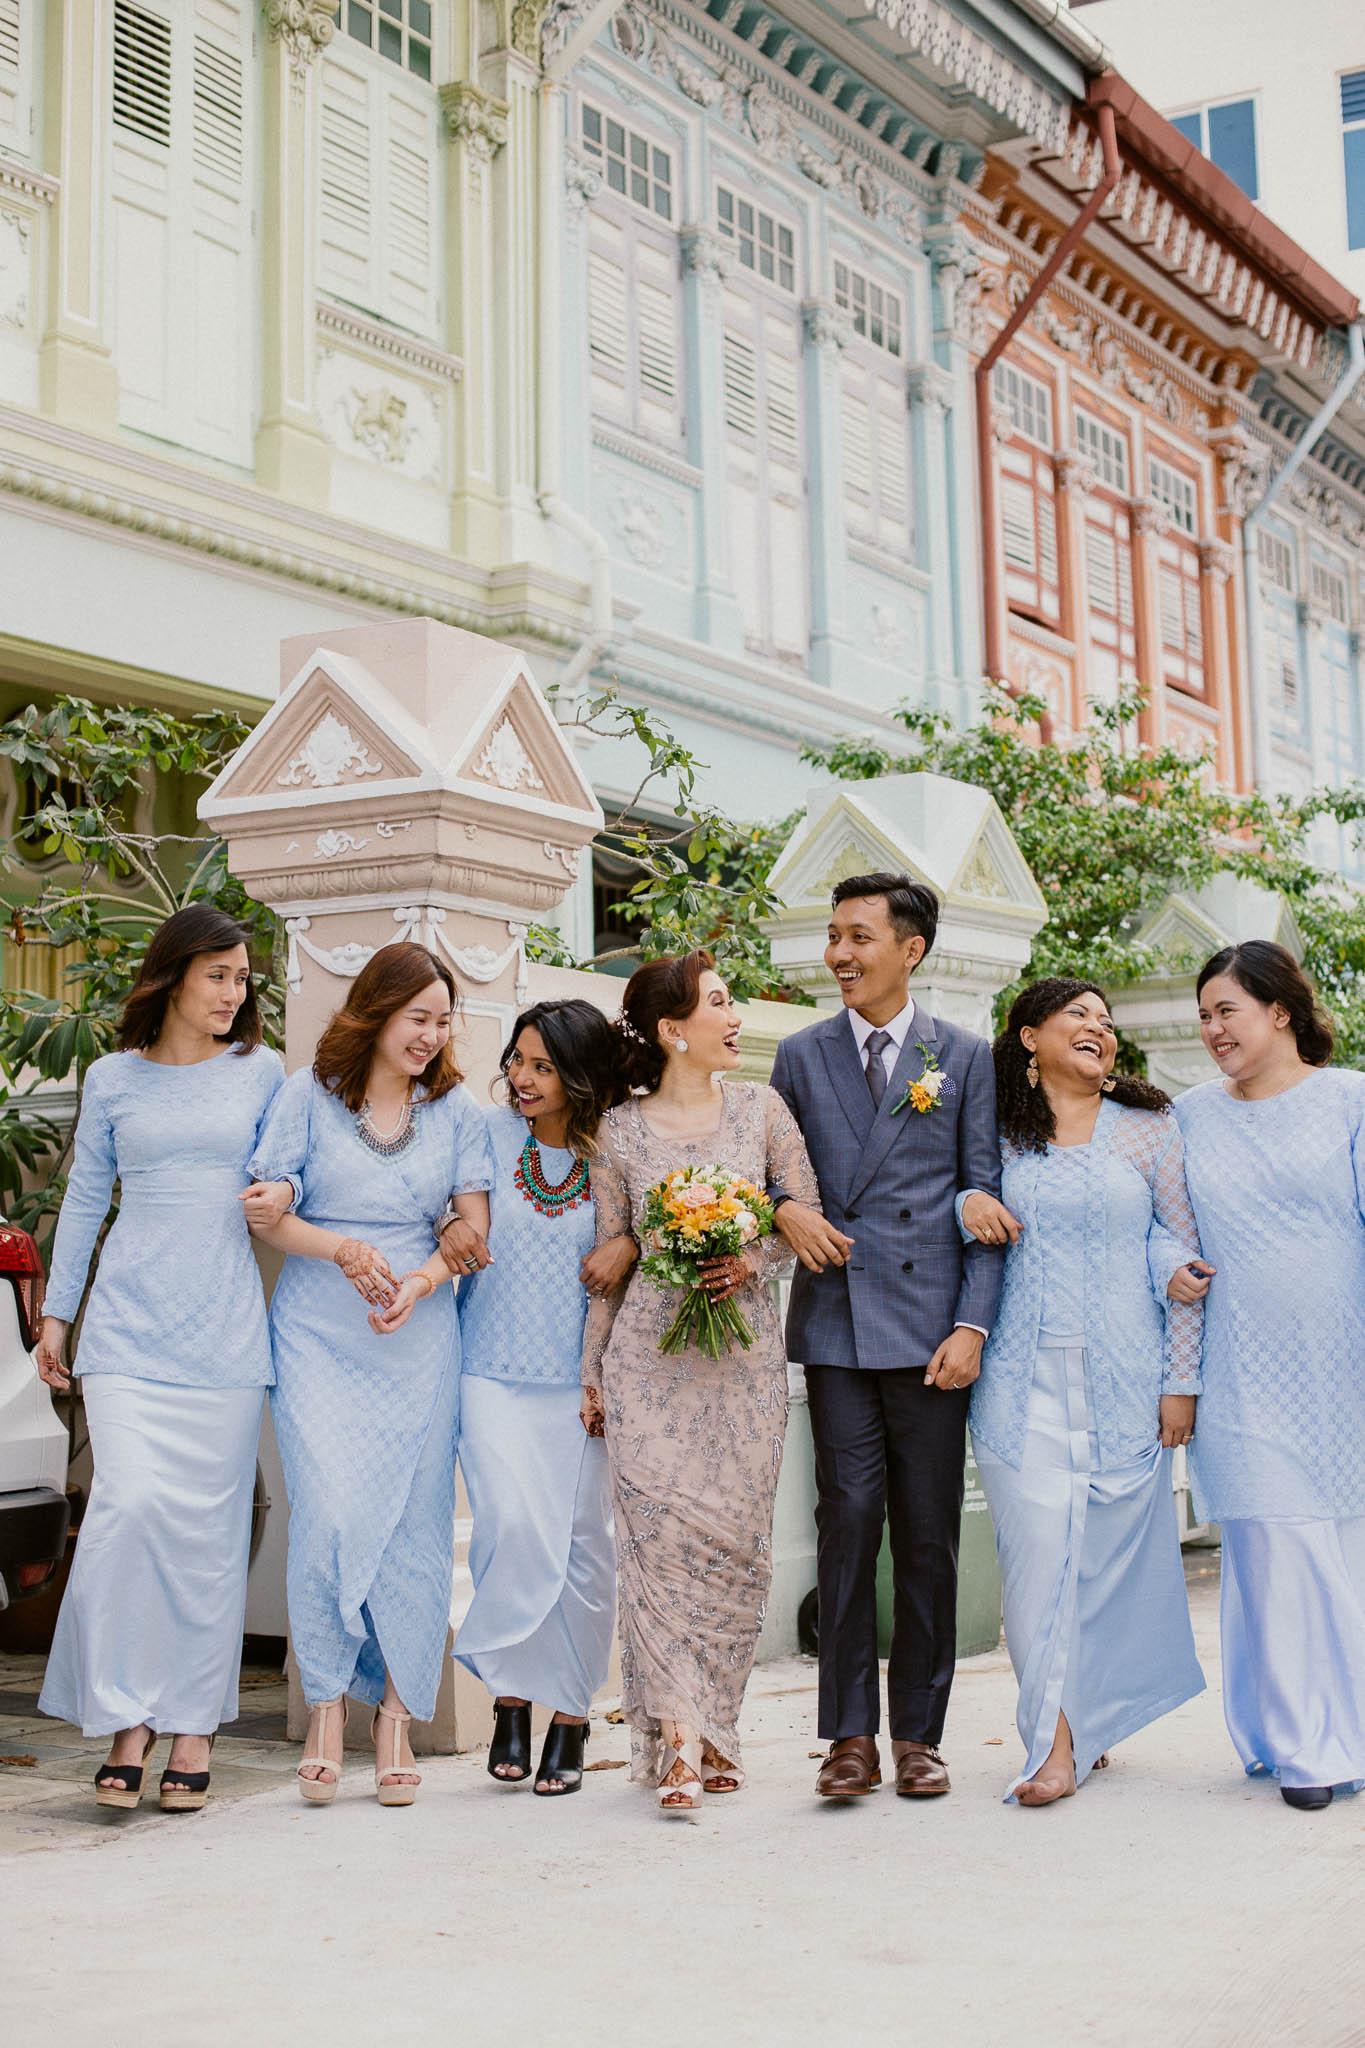 singapore-wedding-photographer-addafiq-nufail-073.jpg